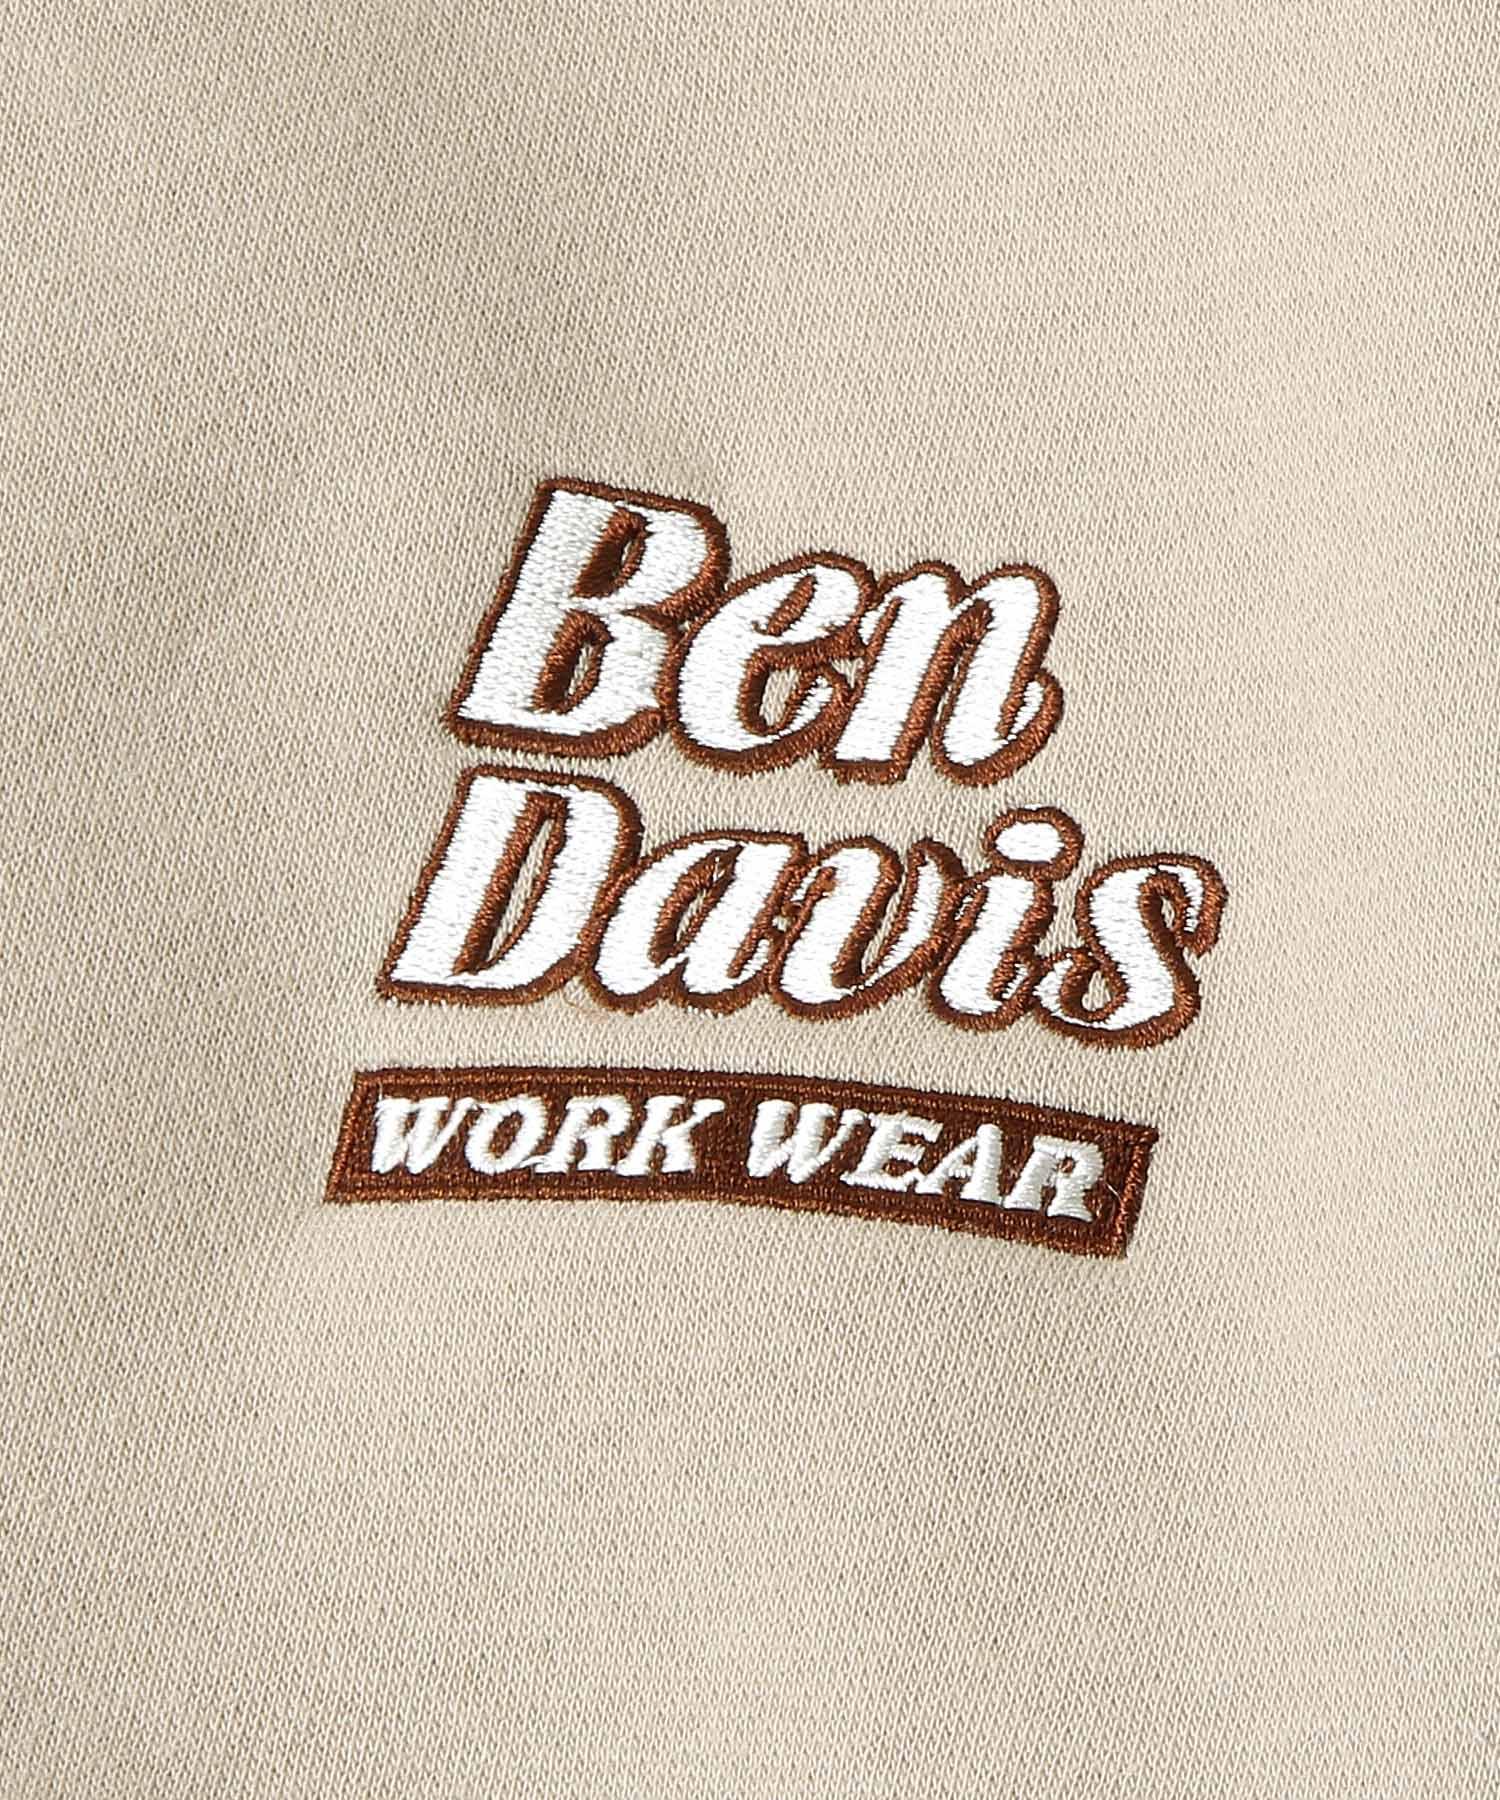 【BEN DAVIS】工藝品圓領運動衫 5